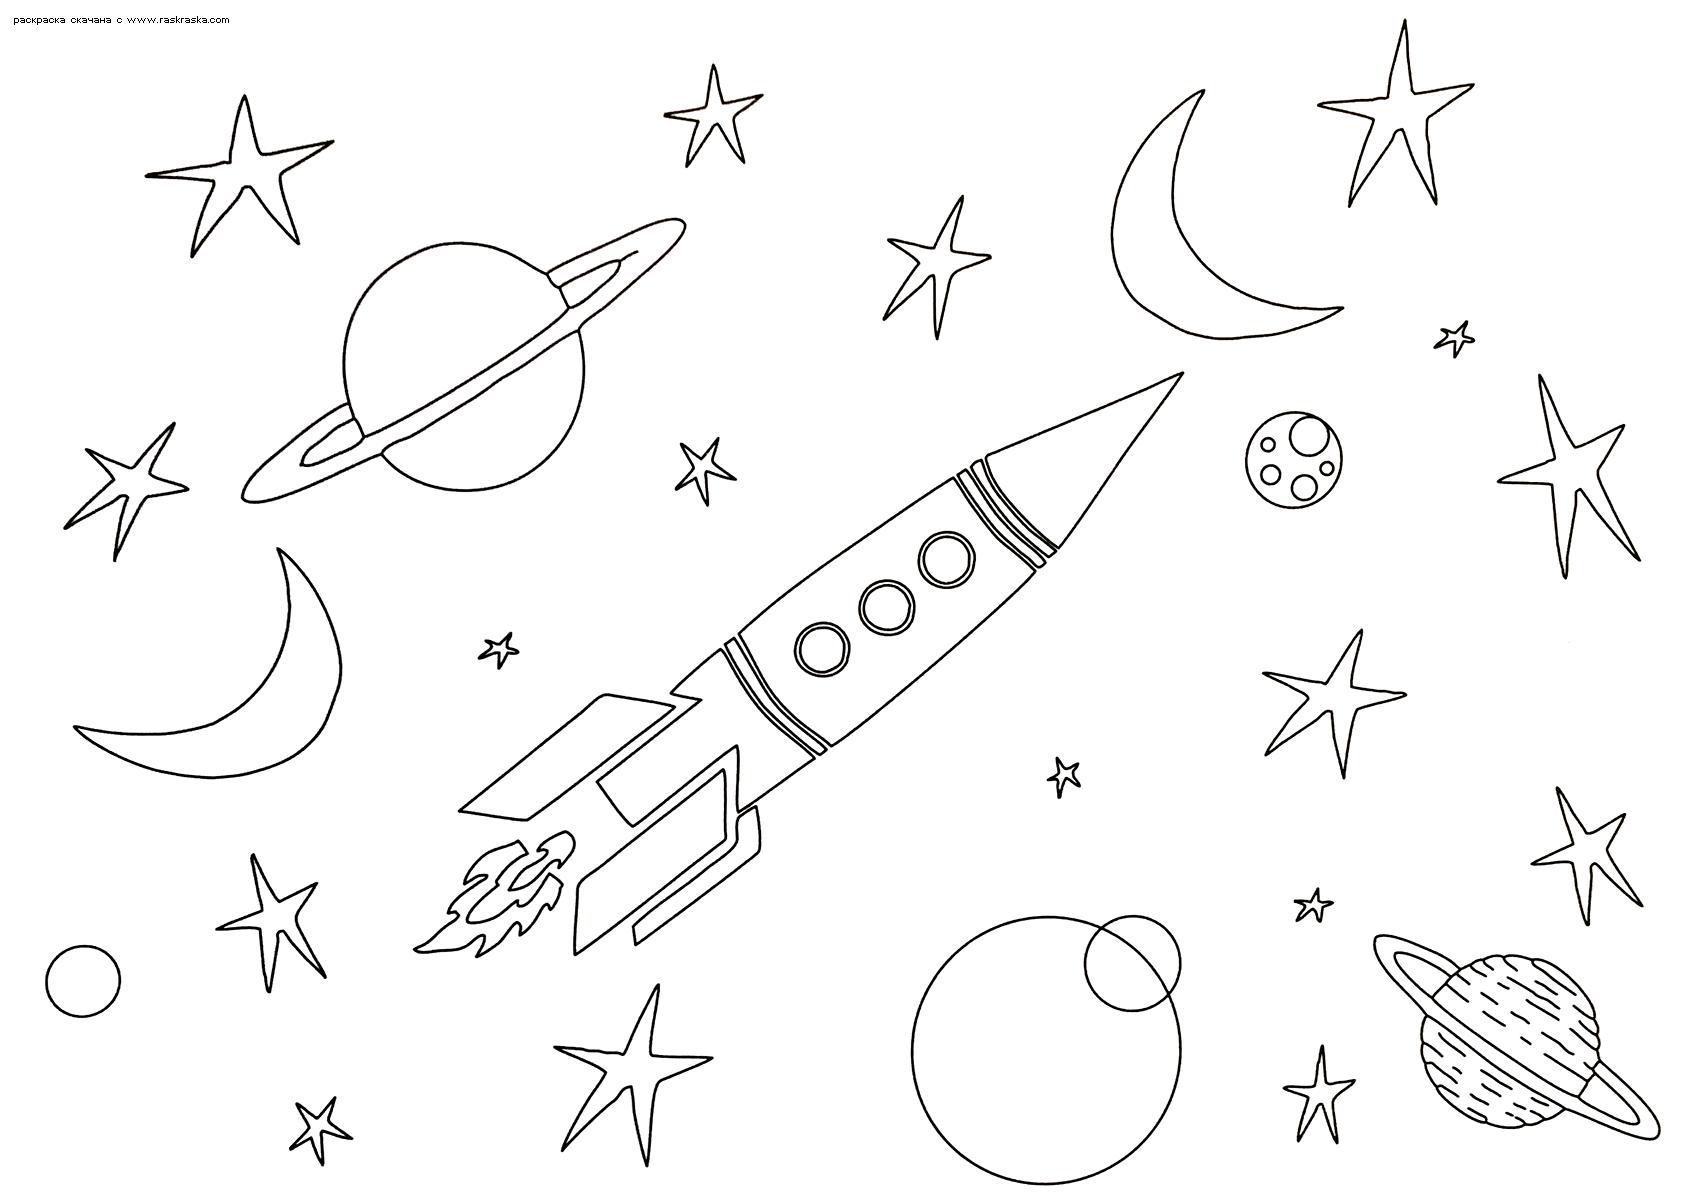 Раскраска Космос. Раскраска ракета, планеты, звезды